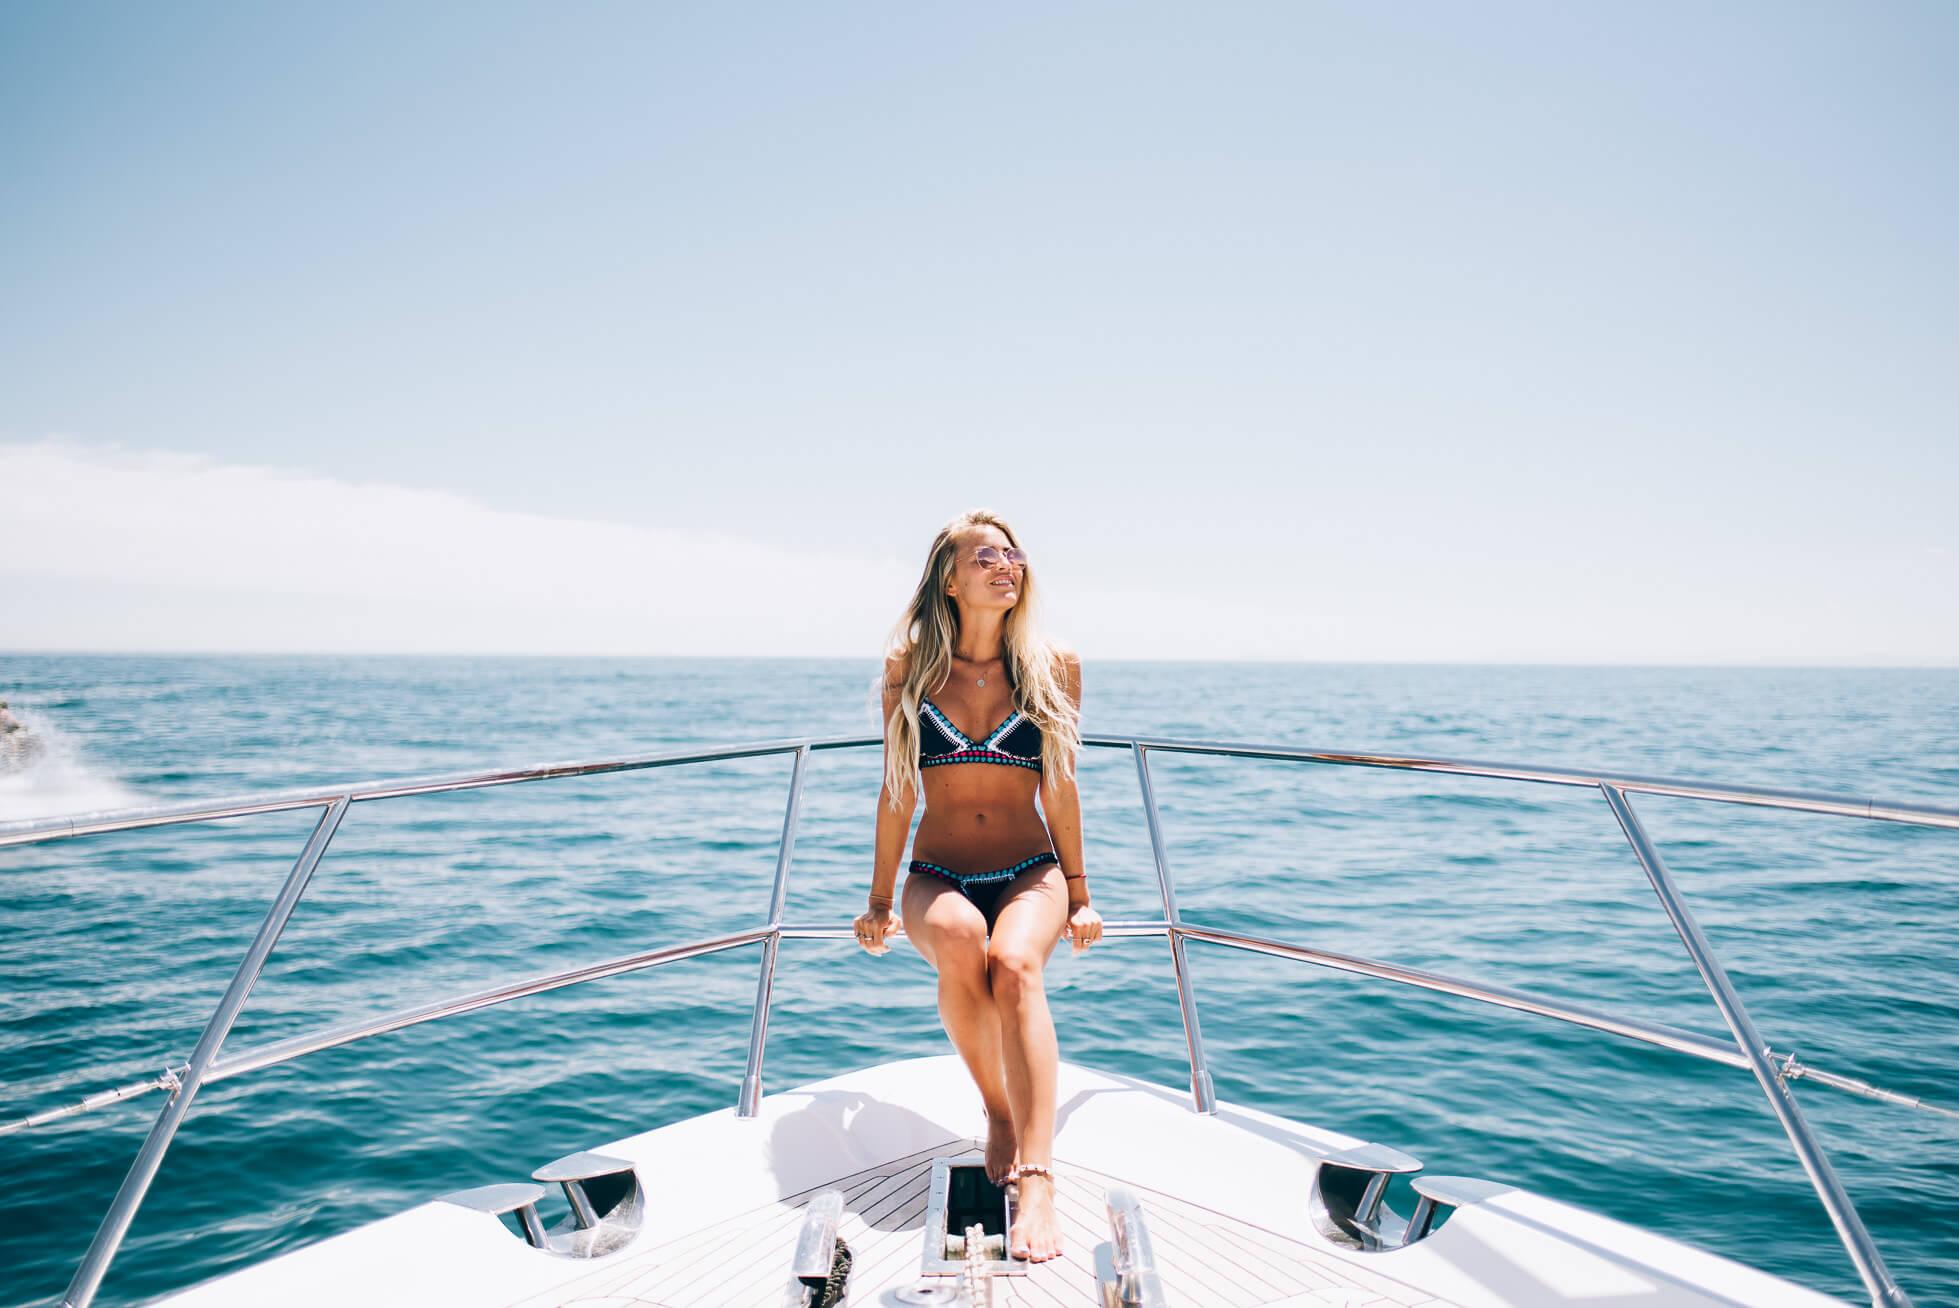 janni-deler-boat-dayDSC_7653